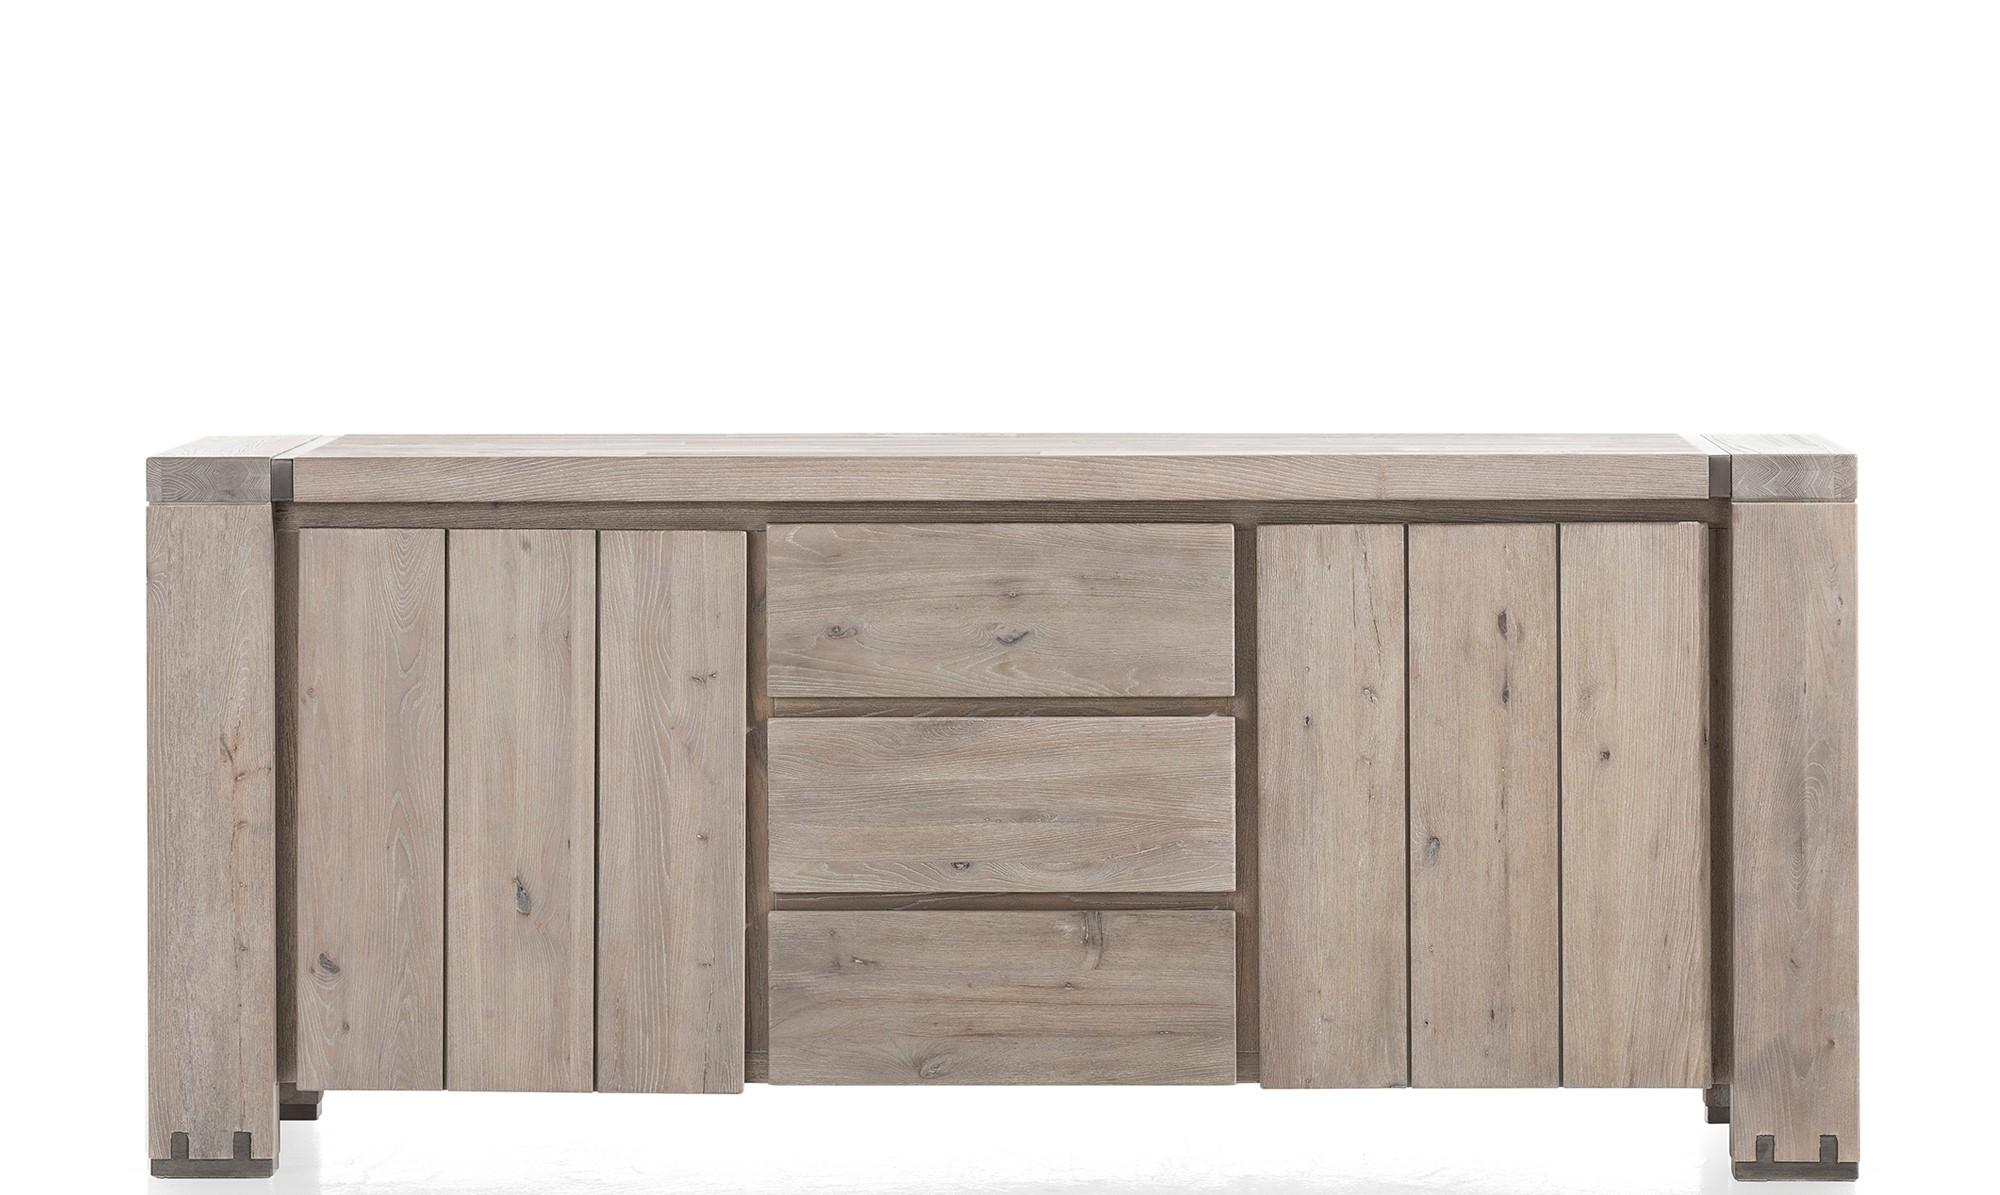 Sideboards - Modern, Oak & Pine Sideboards - Fishpools inside 4 Door Wood Squares Sideboards (Image 28 of 30)